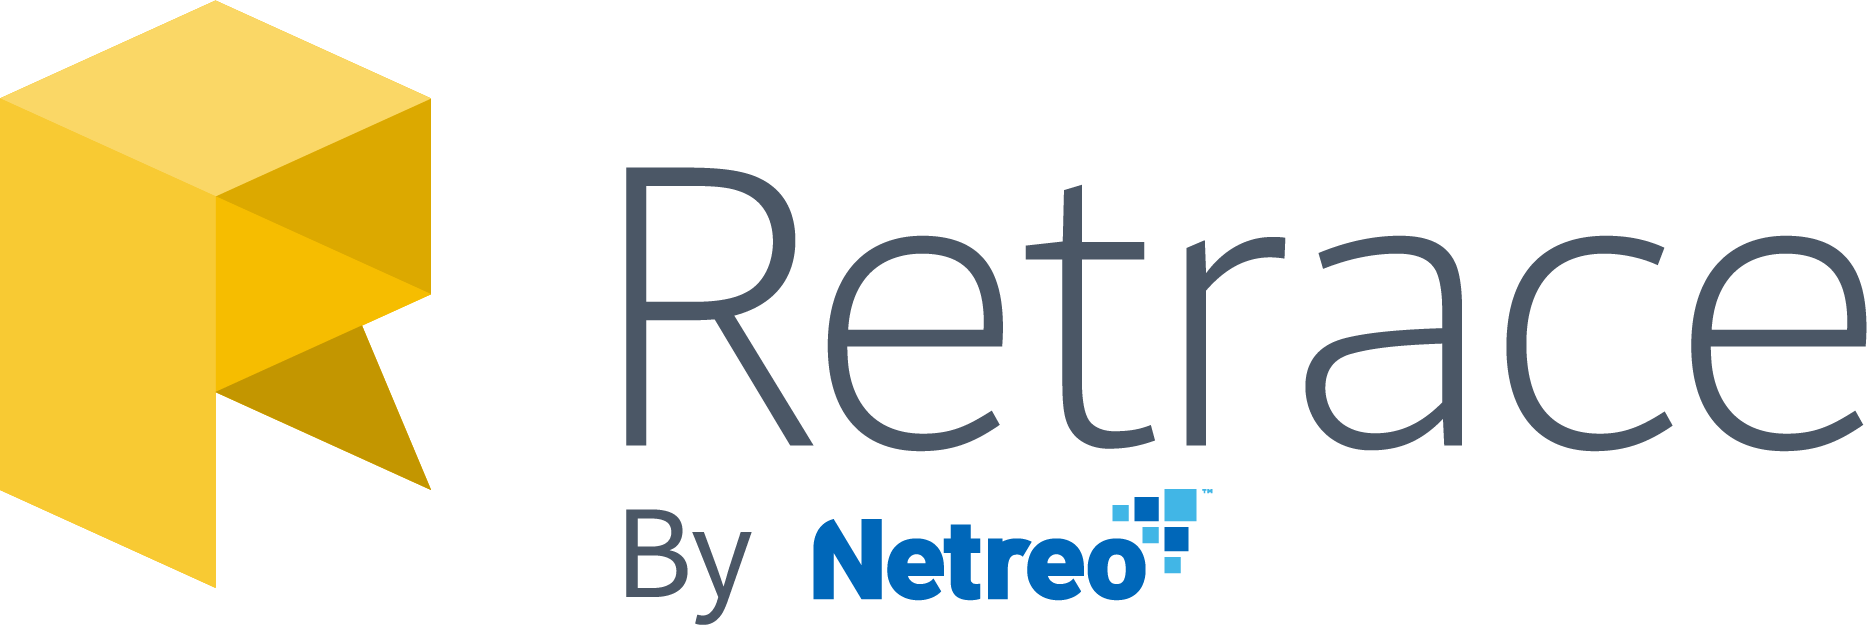 Stackify Retrace by Netreo logo